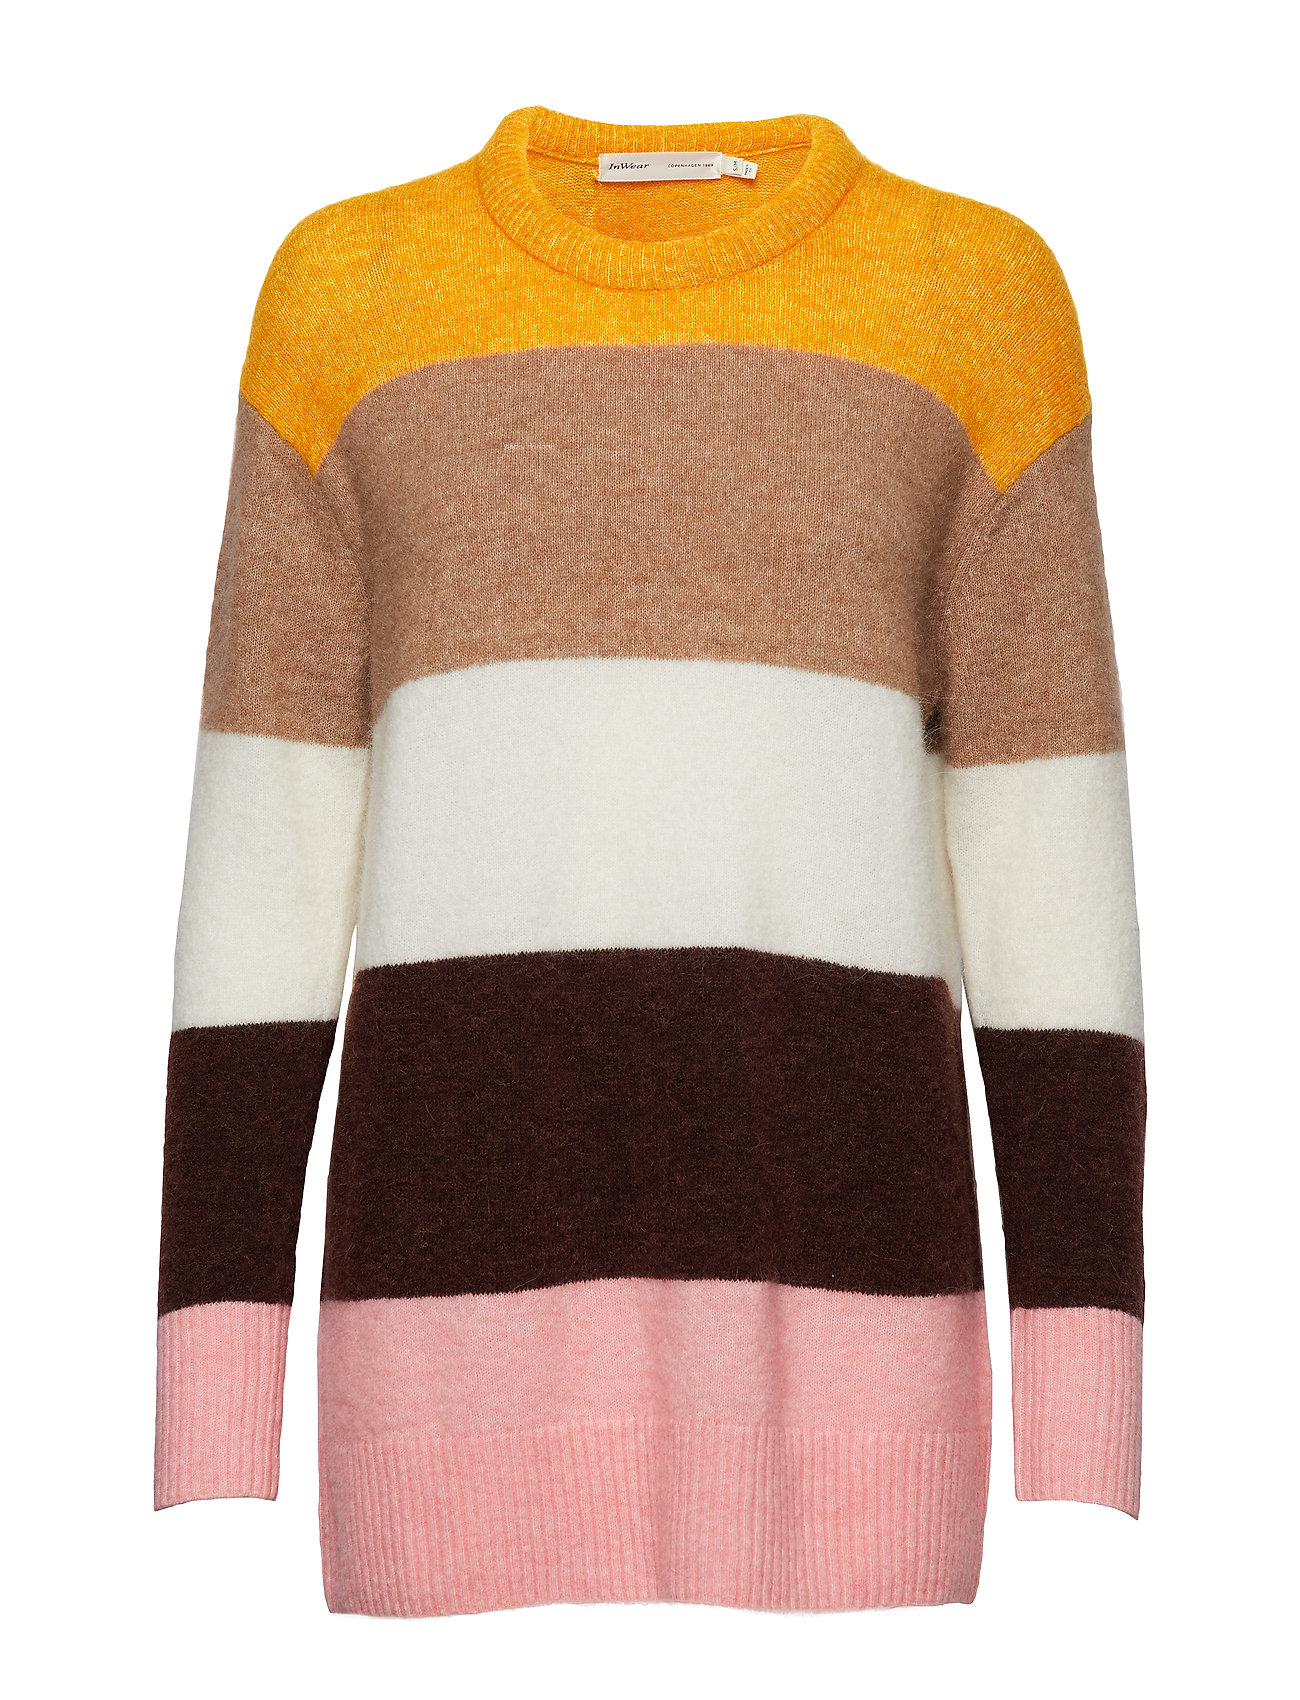 InWear IvanaIW Colour Blocking Pullover - YELLOW COLOUR BLOCKING